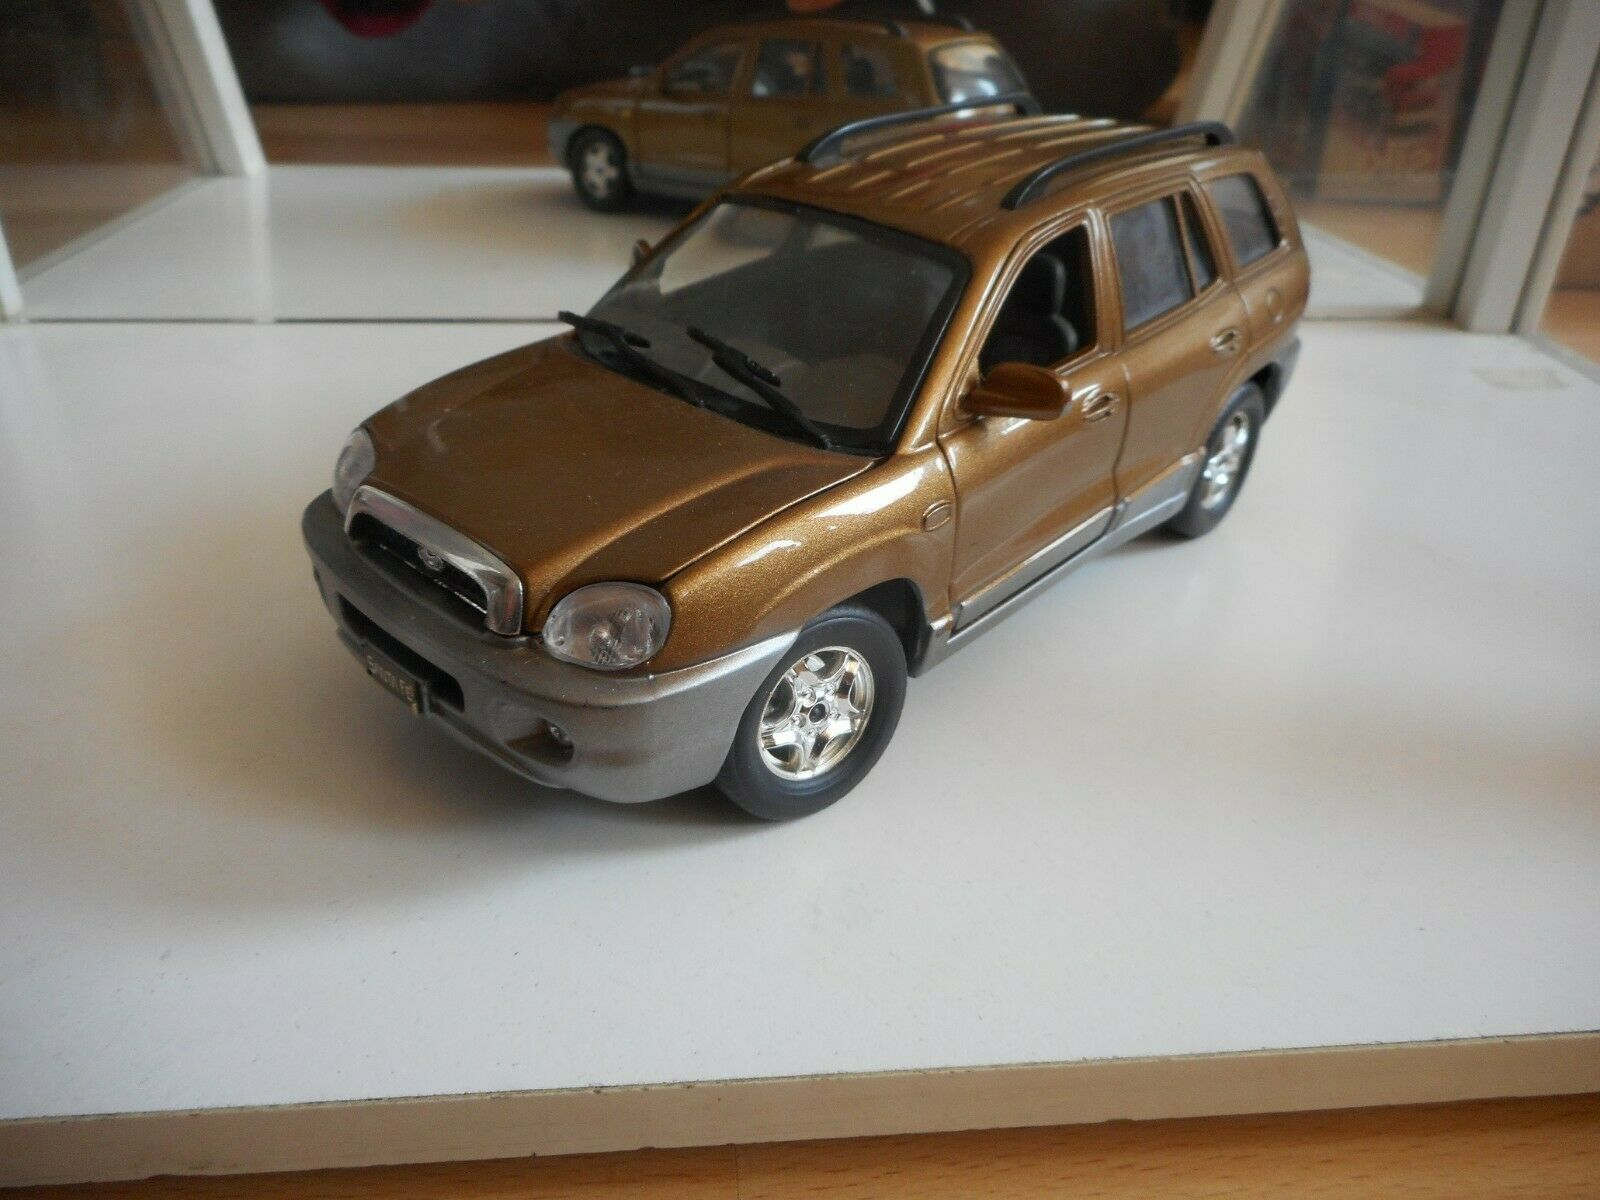 Genuine Accessory Hyundai Santafe 2000 in braun on 1 24